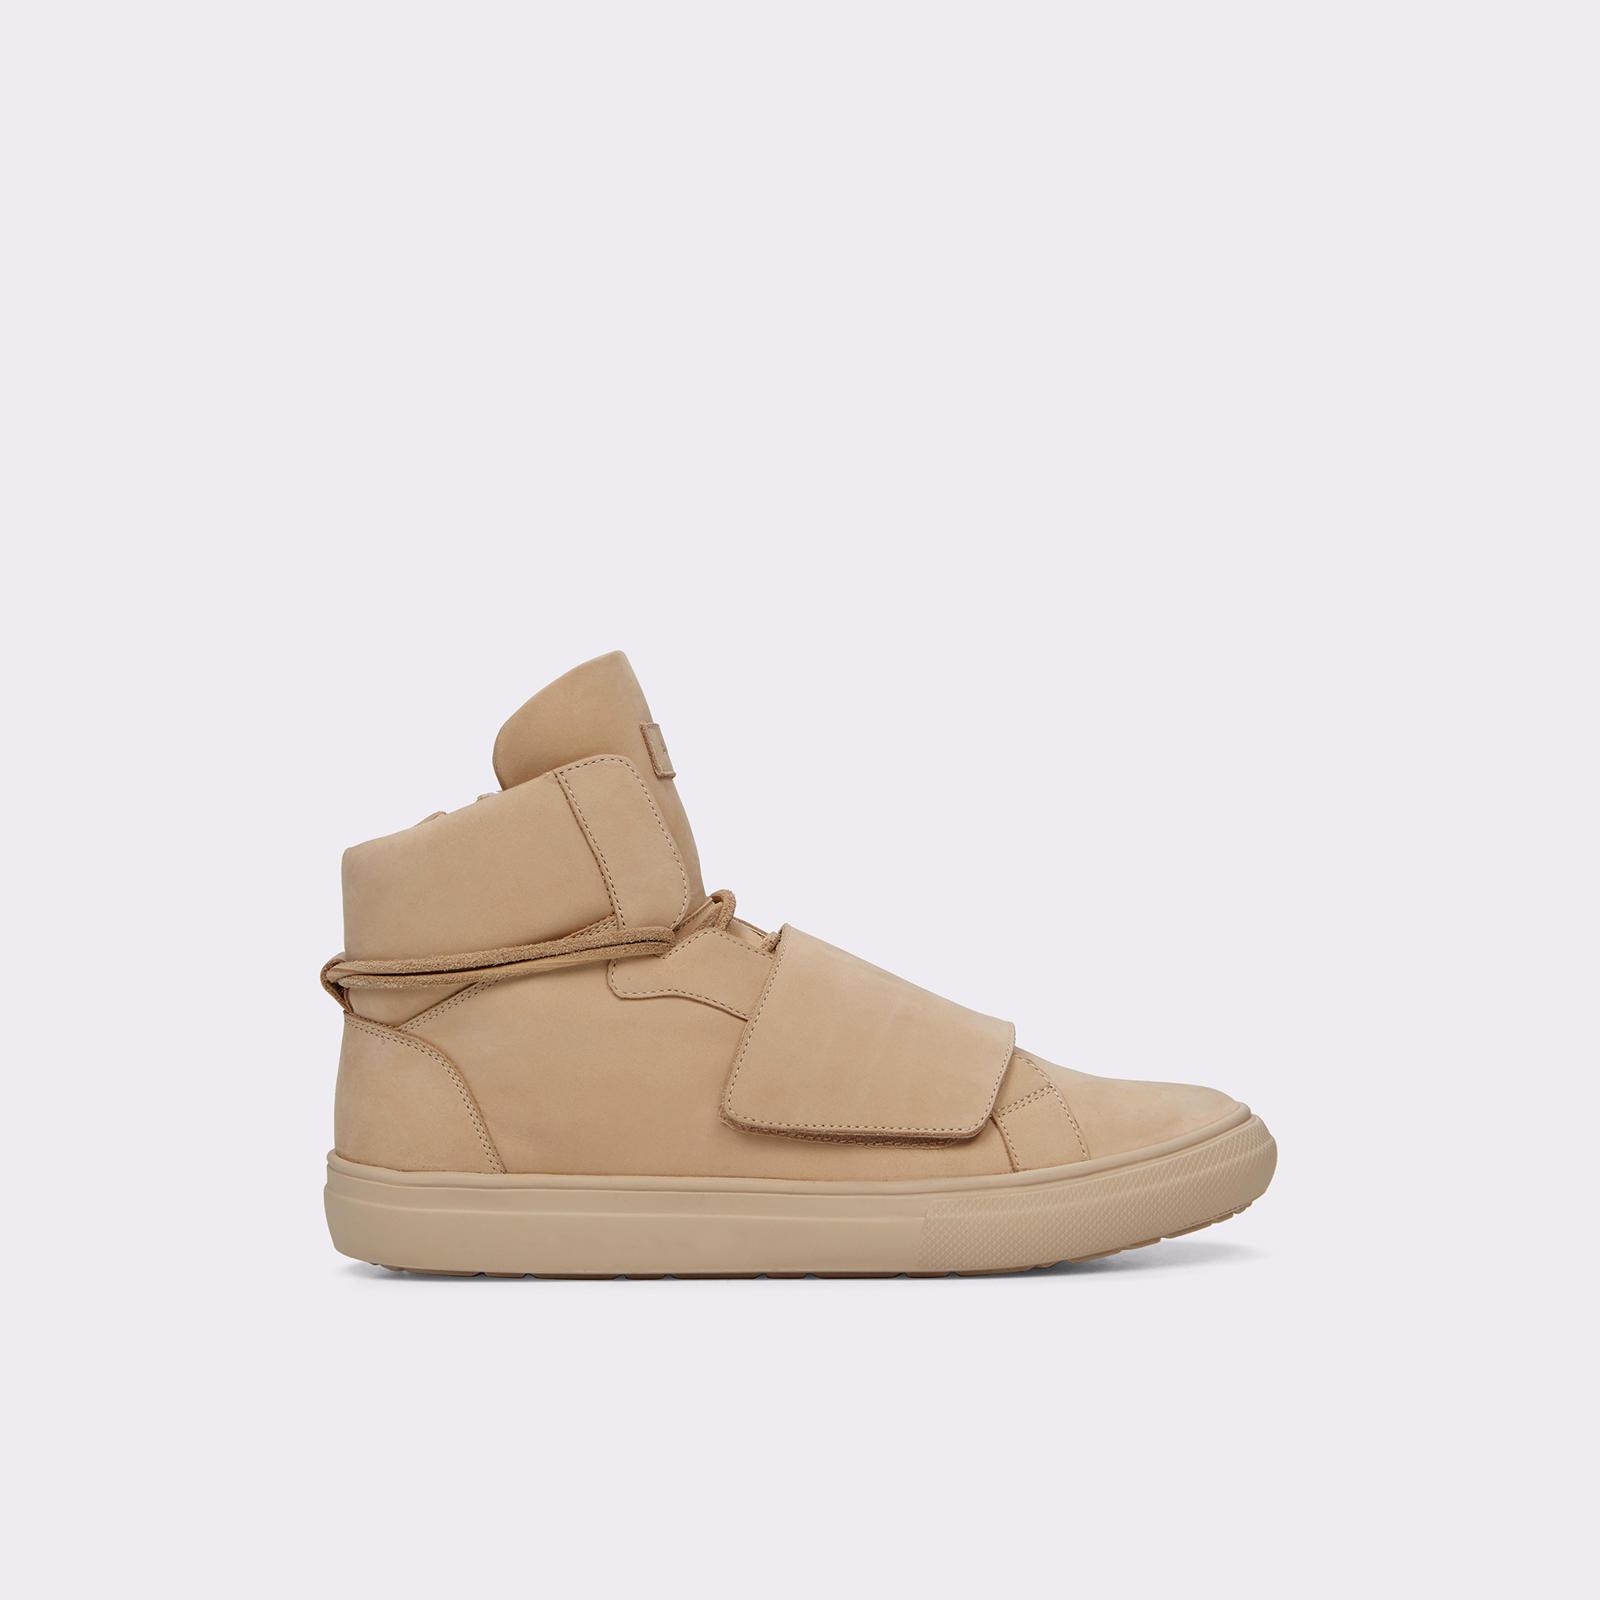 Aldo Shoes Sale Montreal